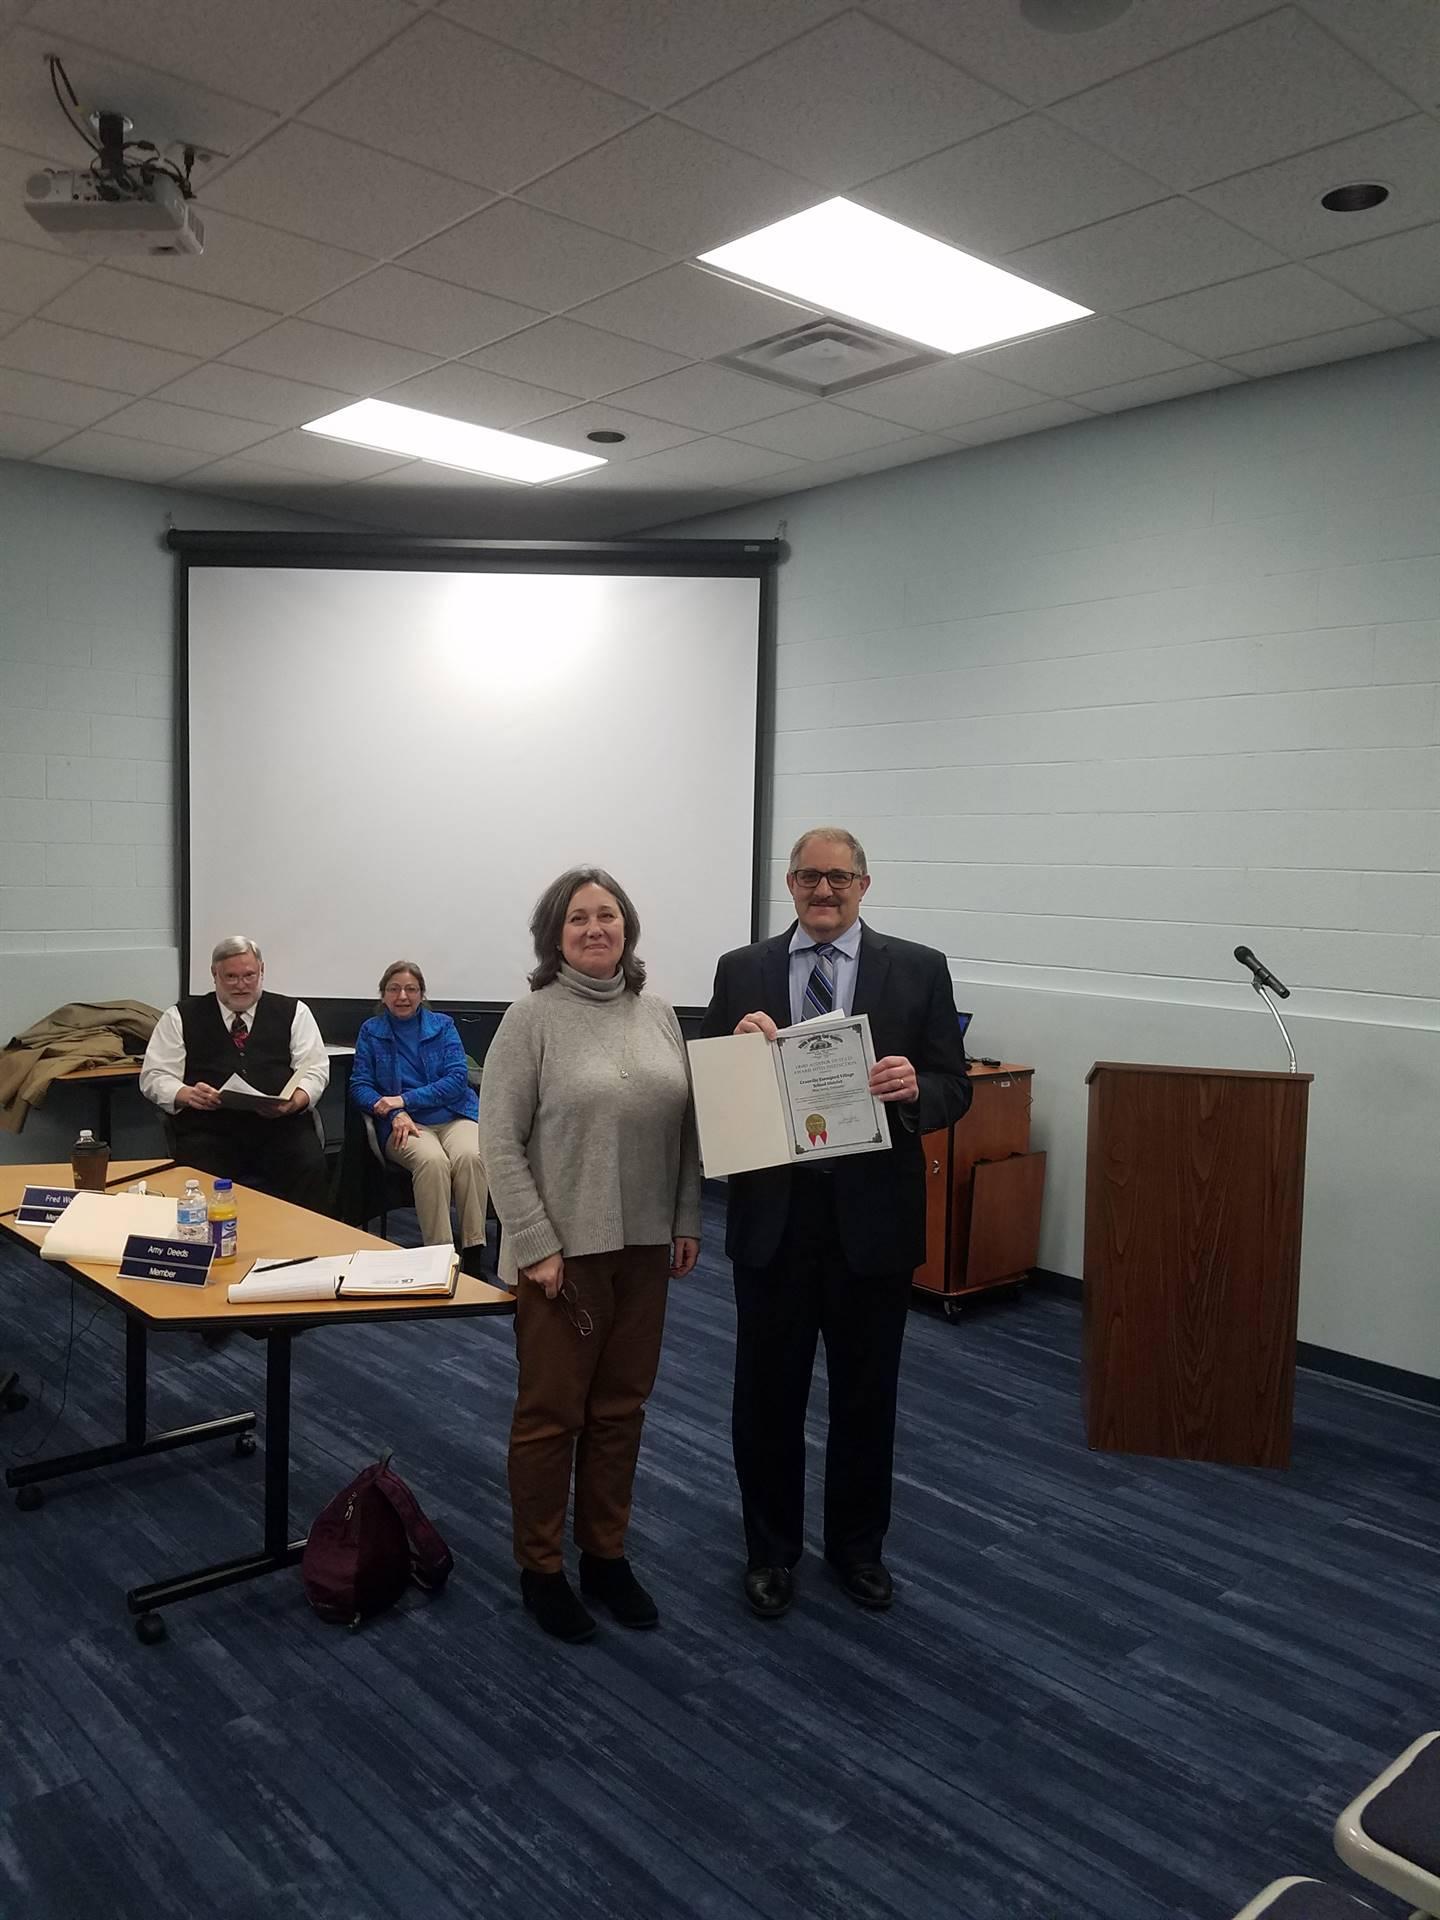 Treasurer Mike Sobul and Asst. Treasurer Tina Washka